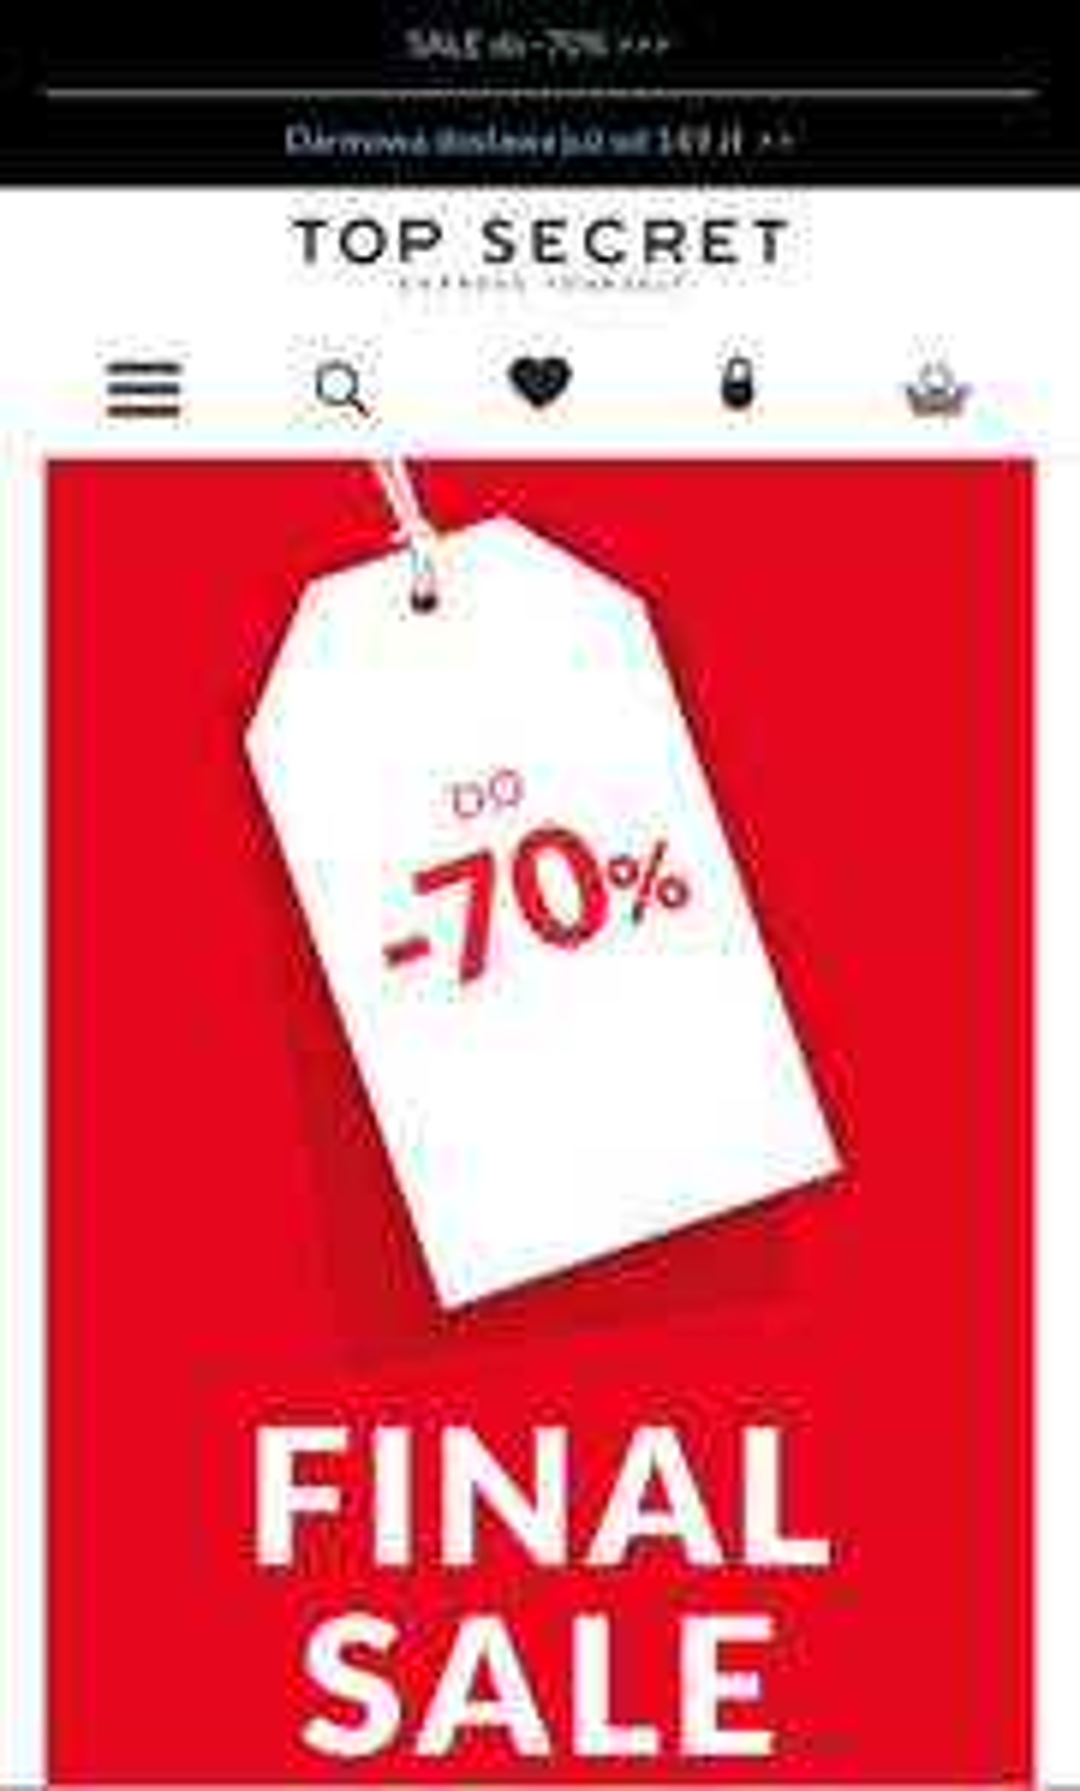 Obniżka cen - 70% w TopSecret